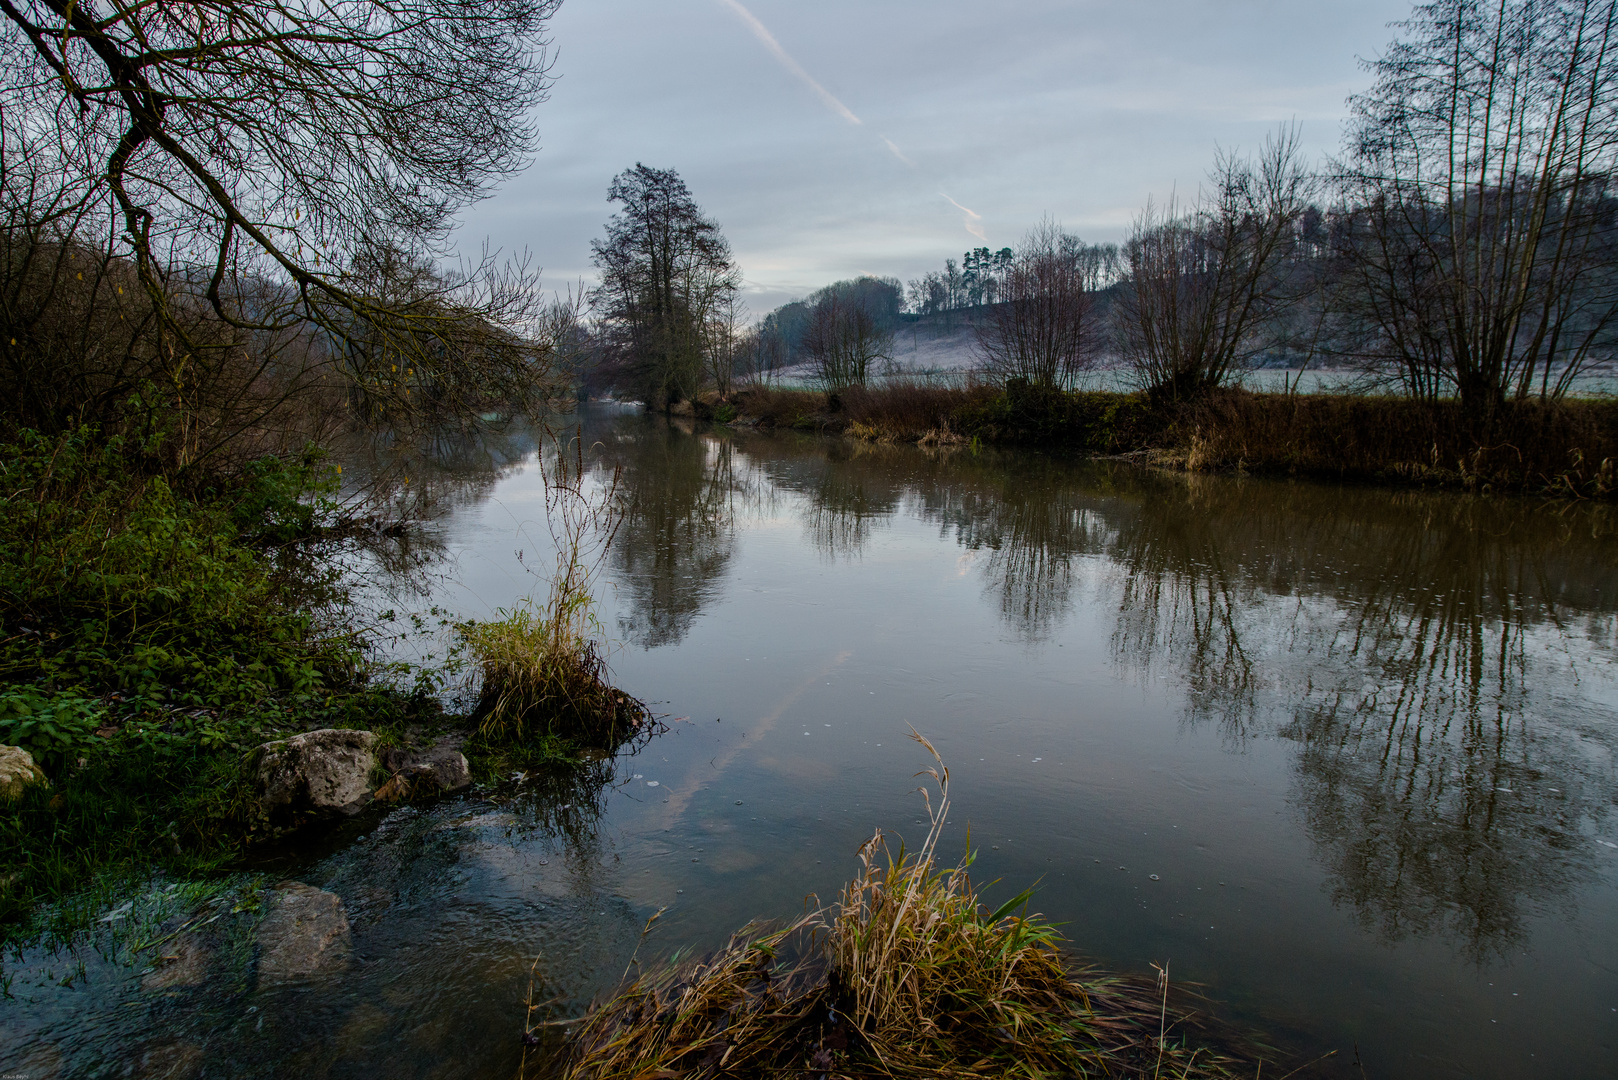 Eine der Brücken am Fluss...http://vimeo.com/29861968